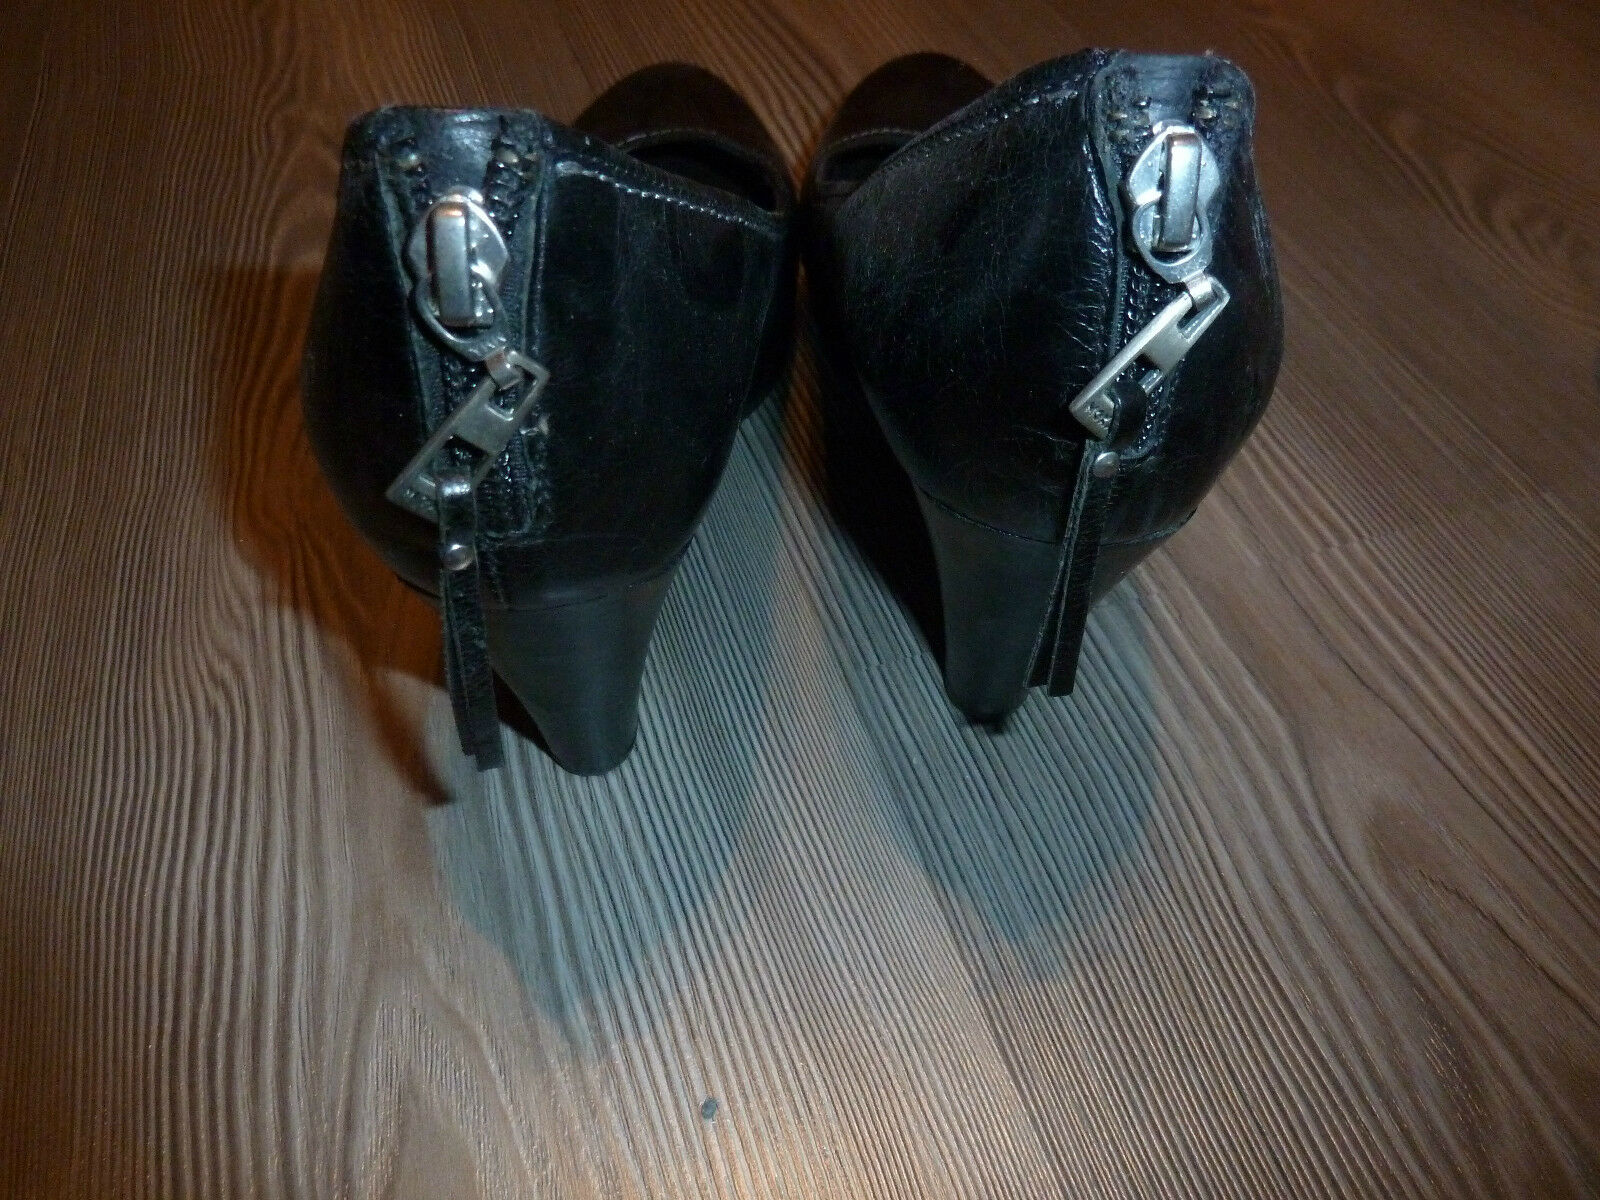 MEXX - sexy,trendy Damen Damens Plateau Pumps Pumps Pumps - schwarz - Gr.39 - Leder/ Samt WOW a69ee5